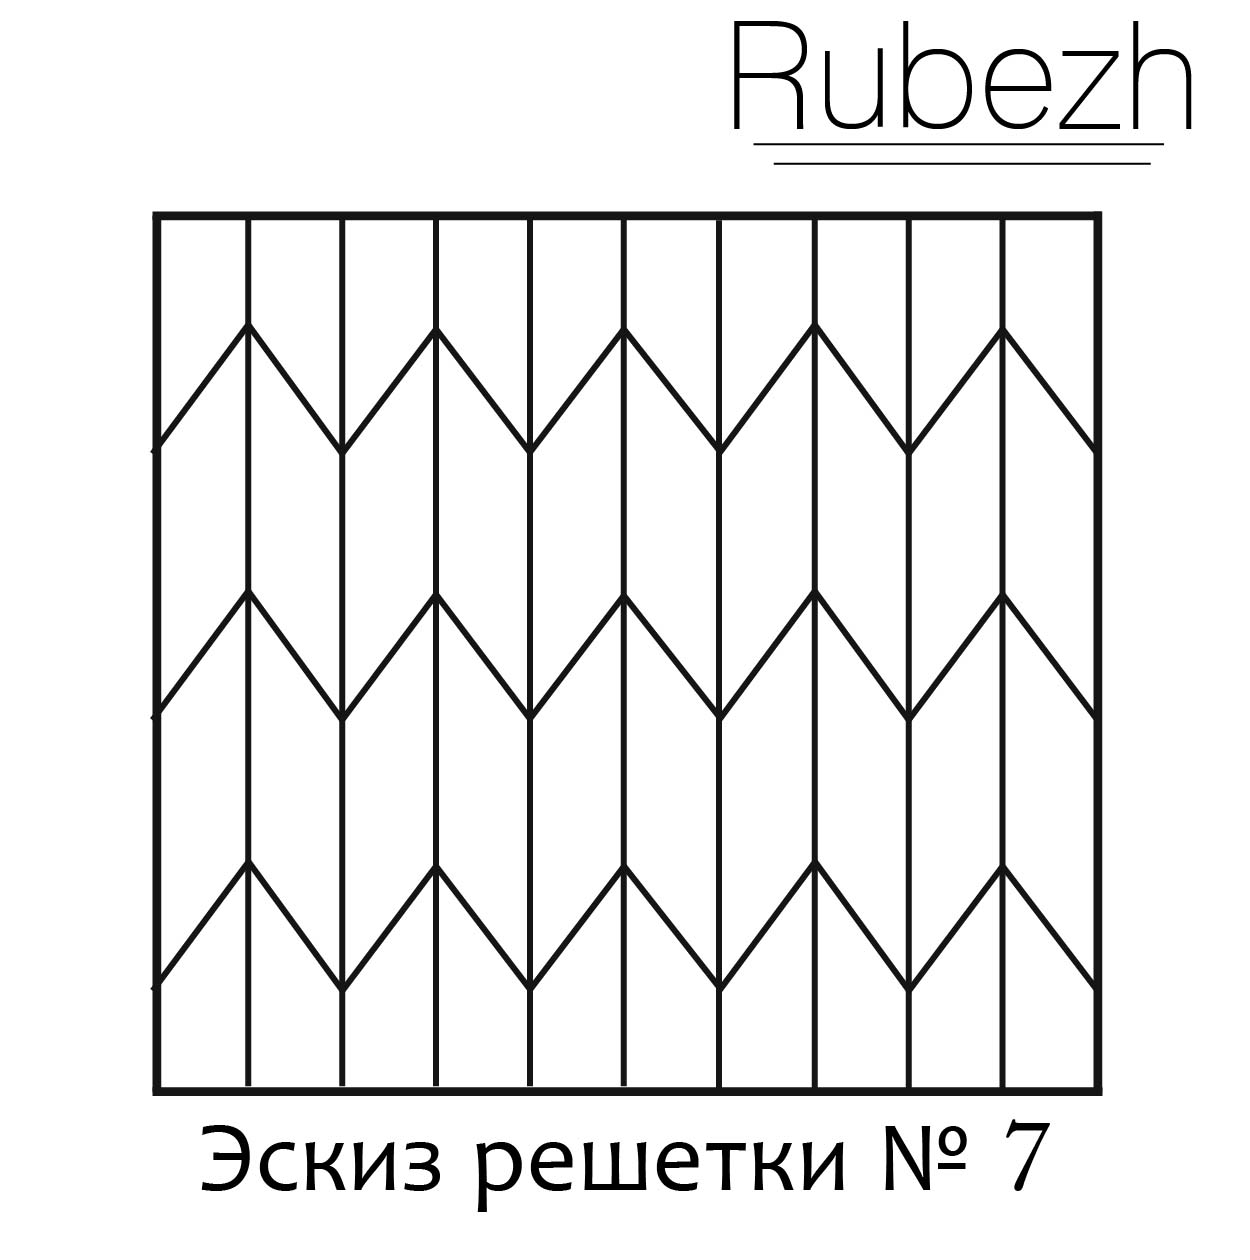 Эскиз решетки № 7